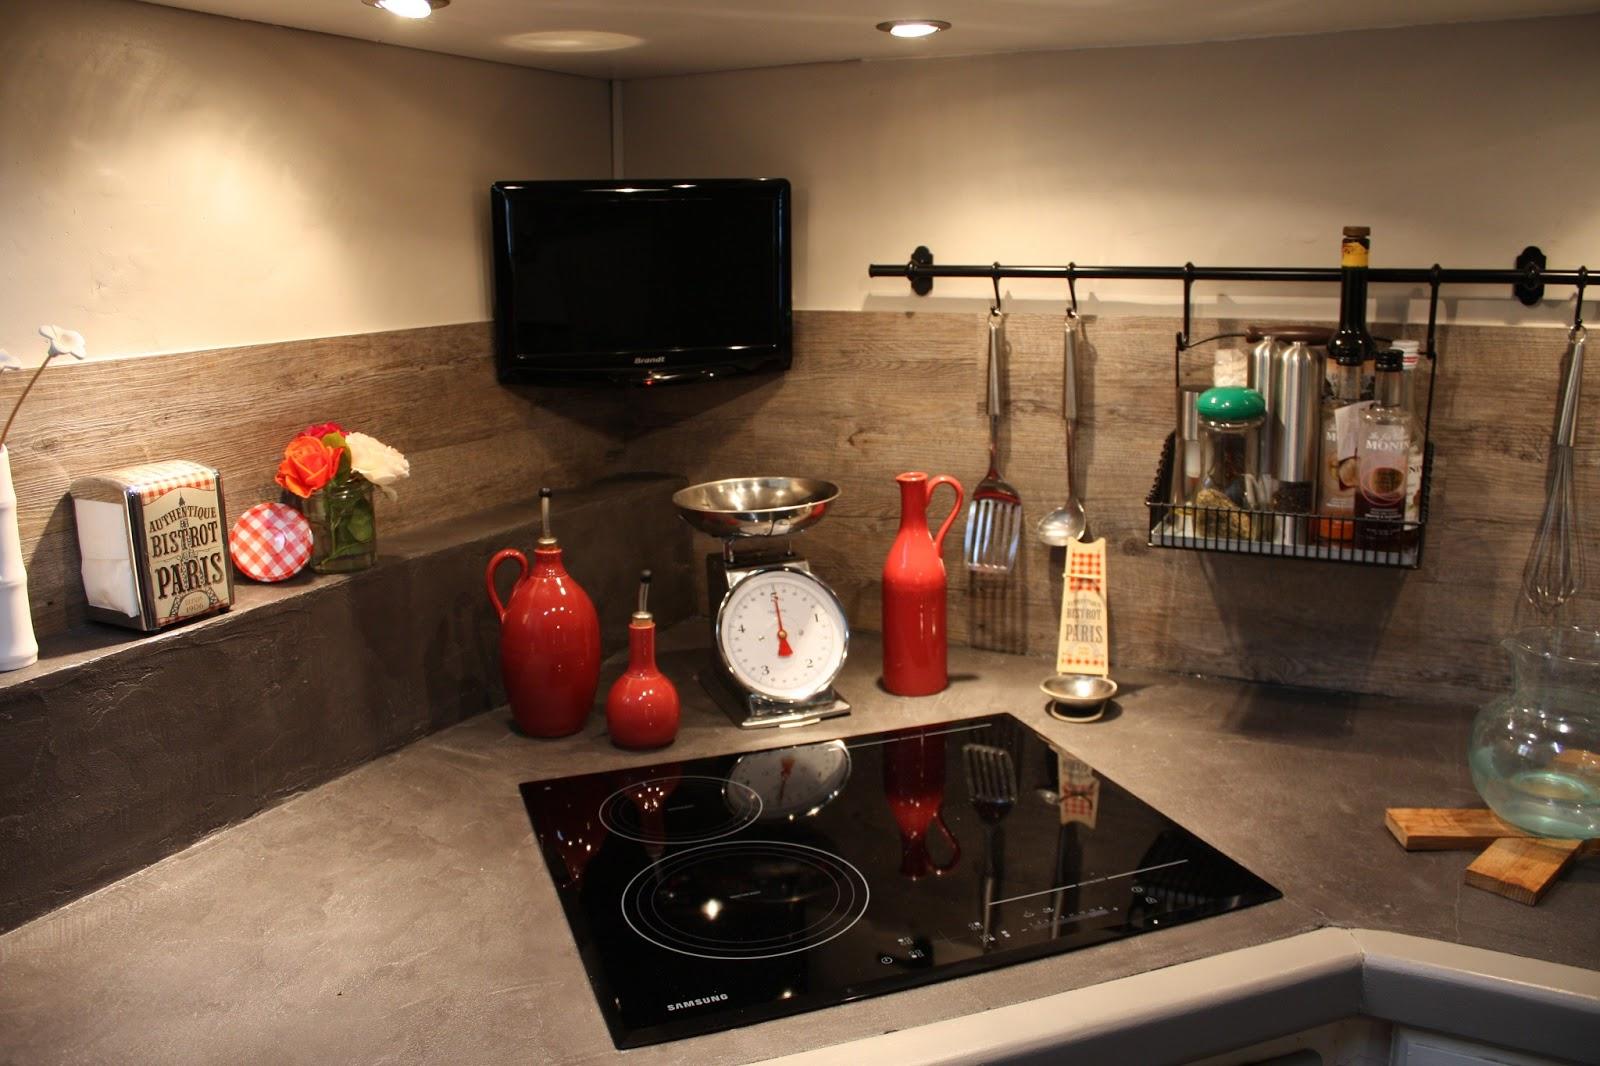 Beton cir castorama resinence id e for Enduit decoratif cuisine